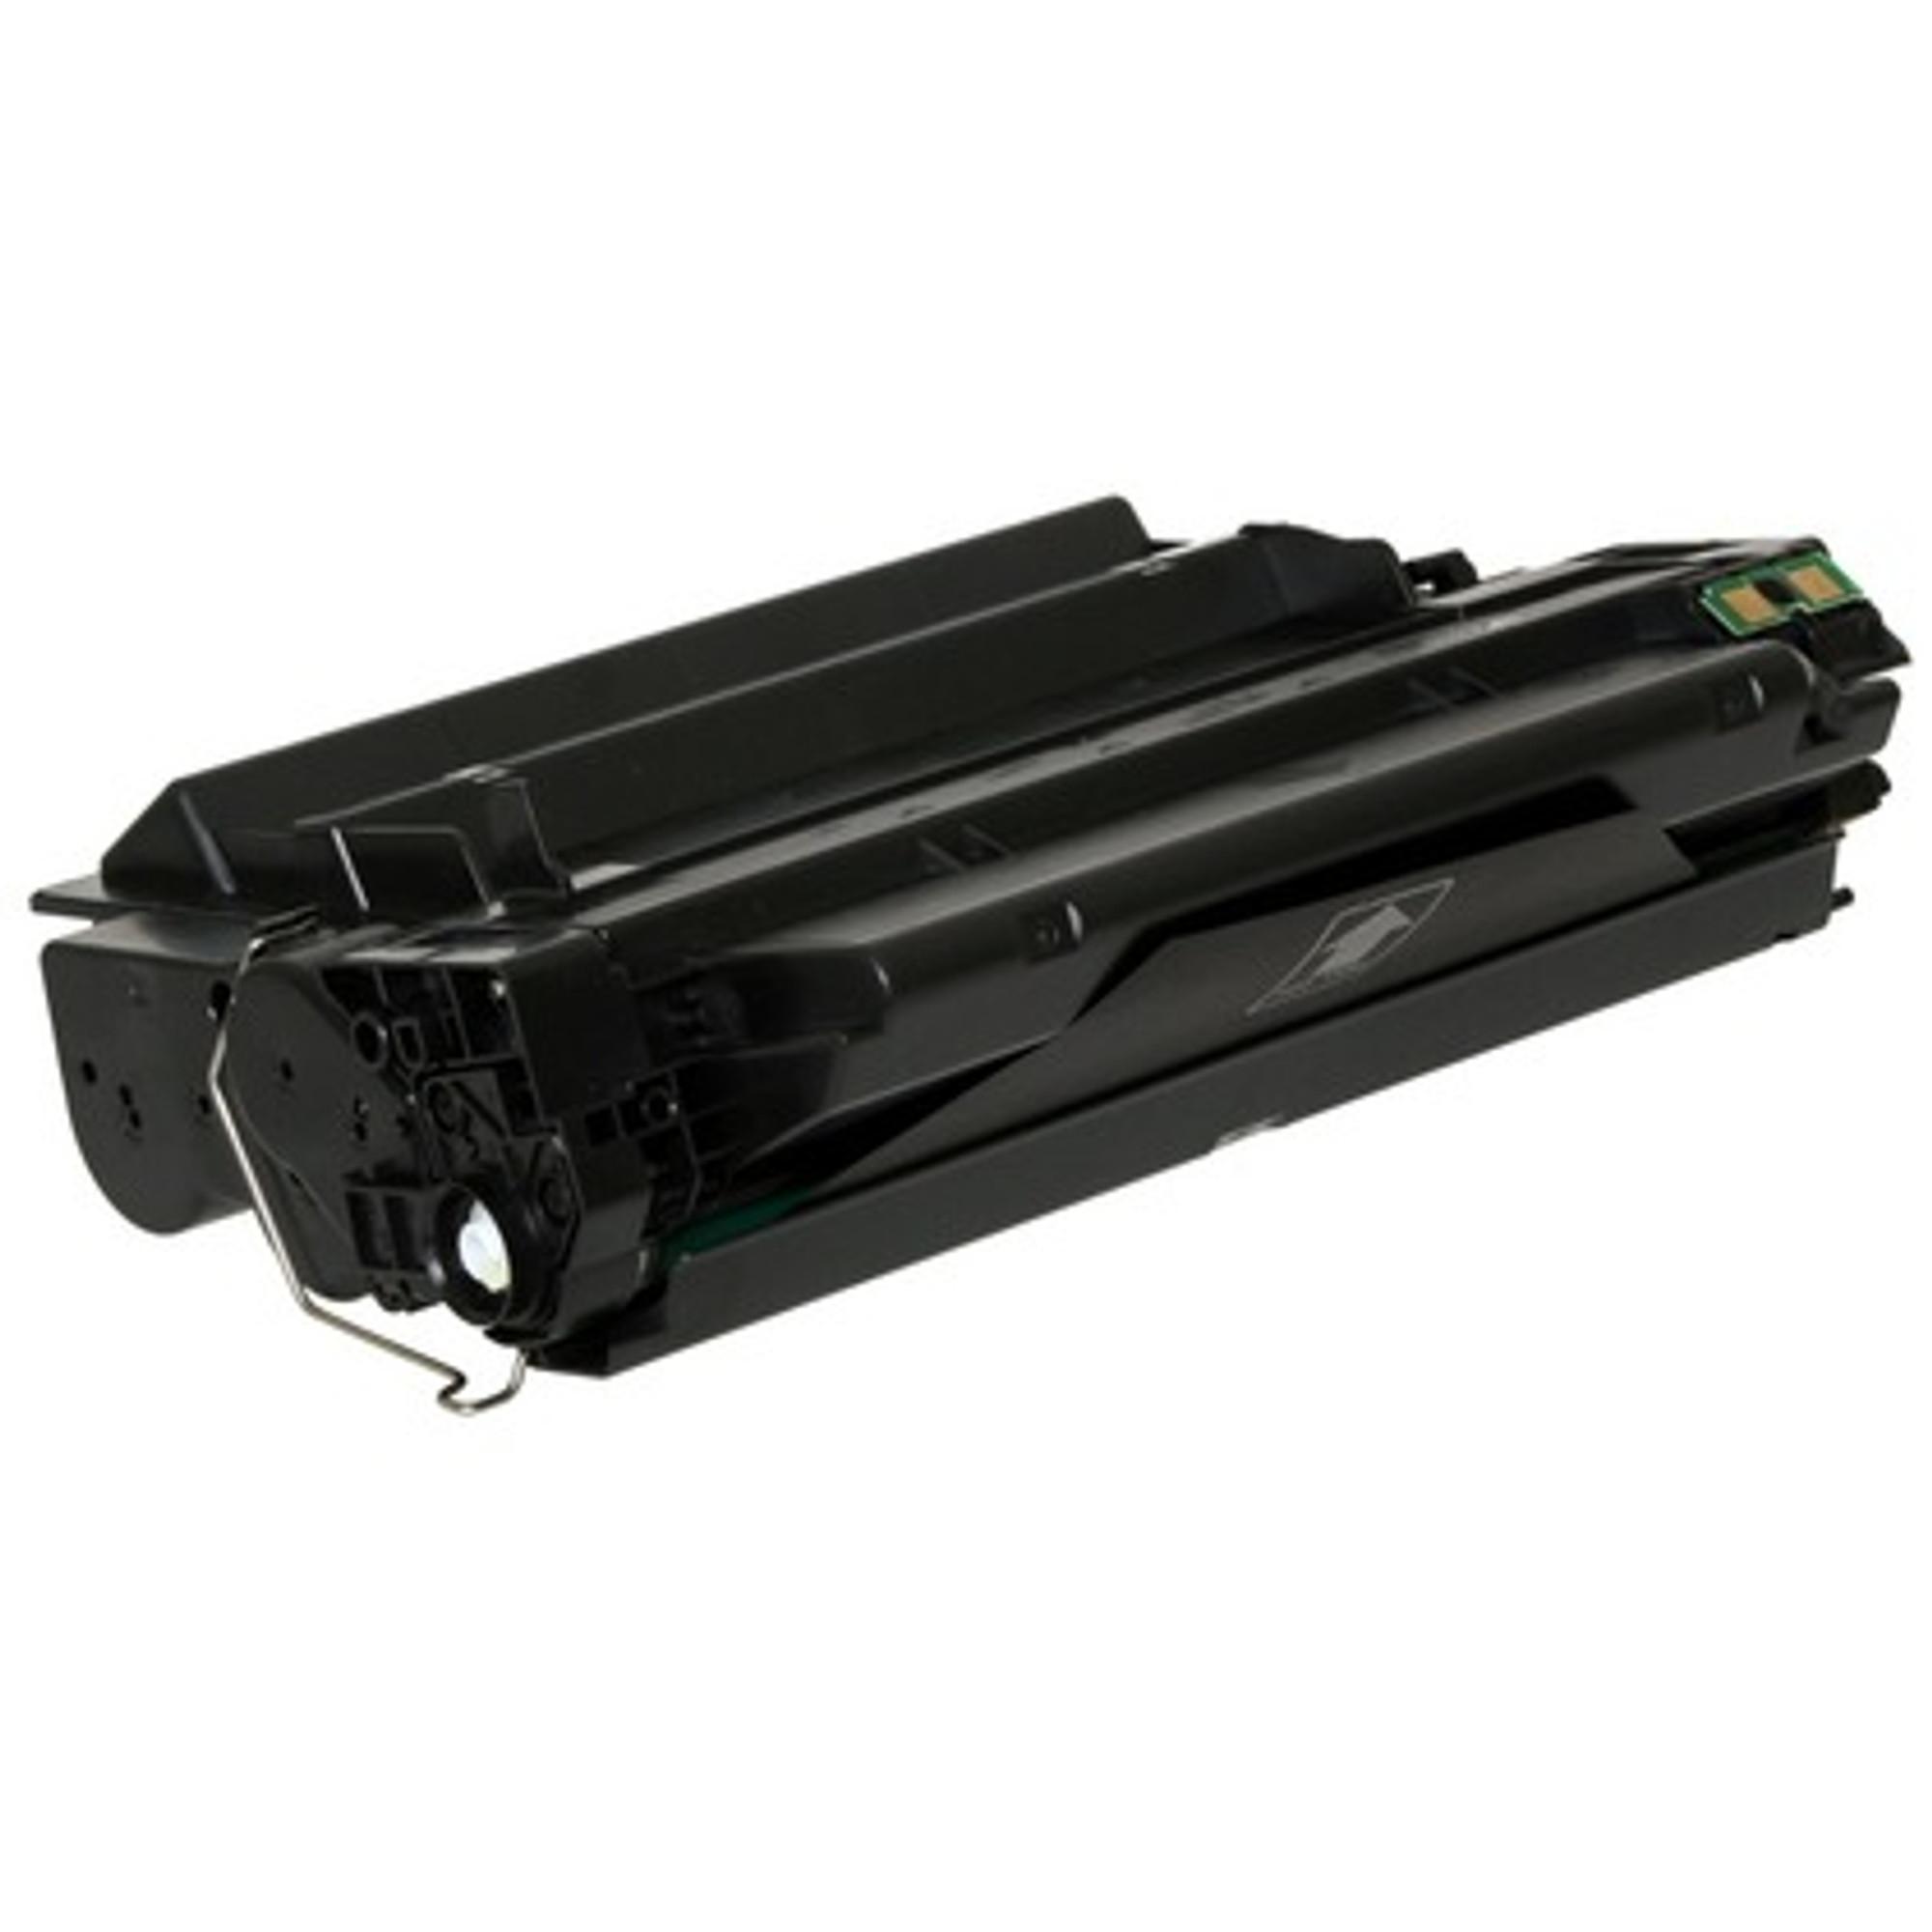 Eurotone Refill Toner Chip for HP Laserjet M 3027 3035 X xs MFP Fills Q7551A 51A